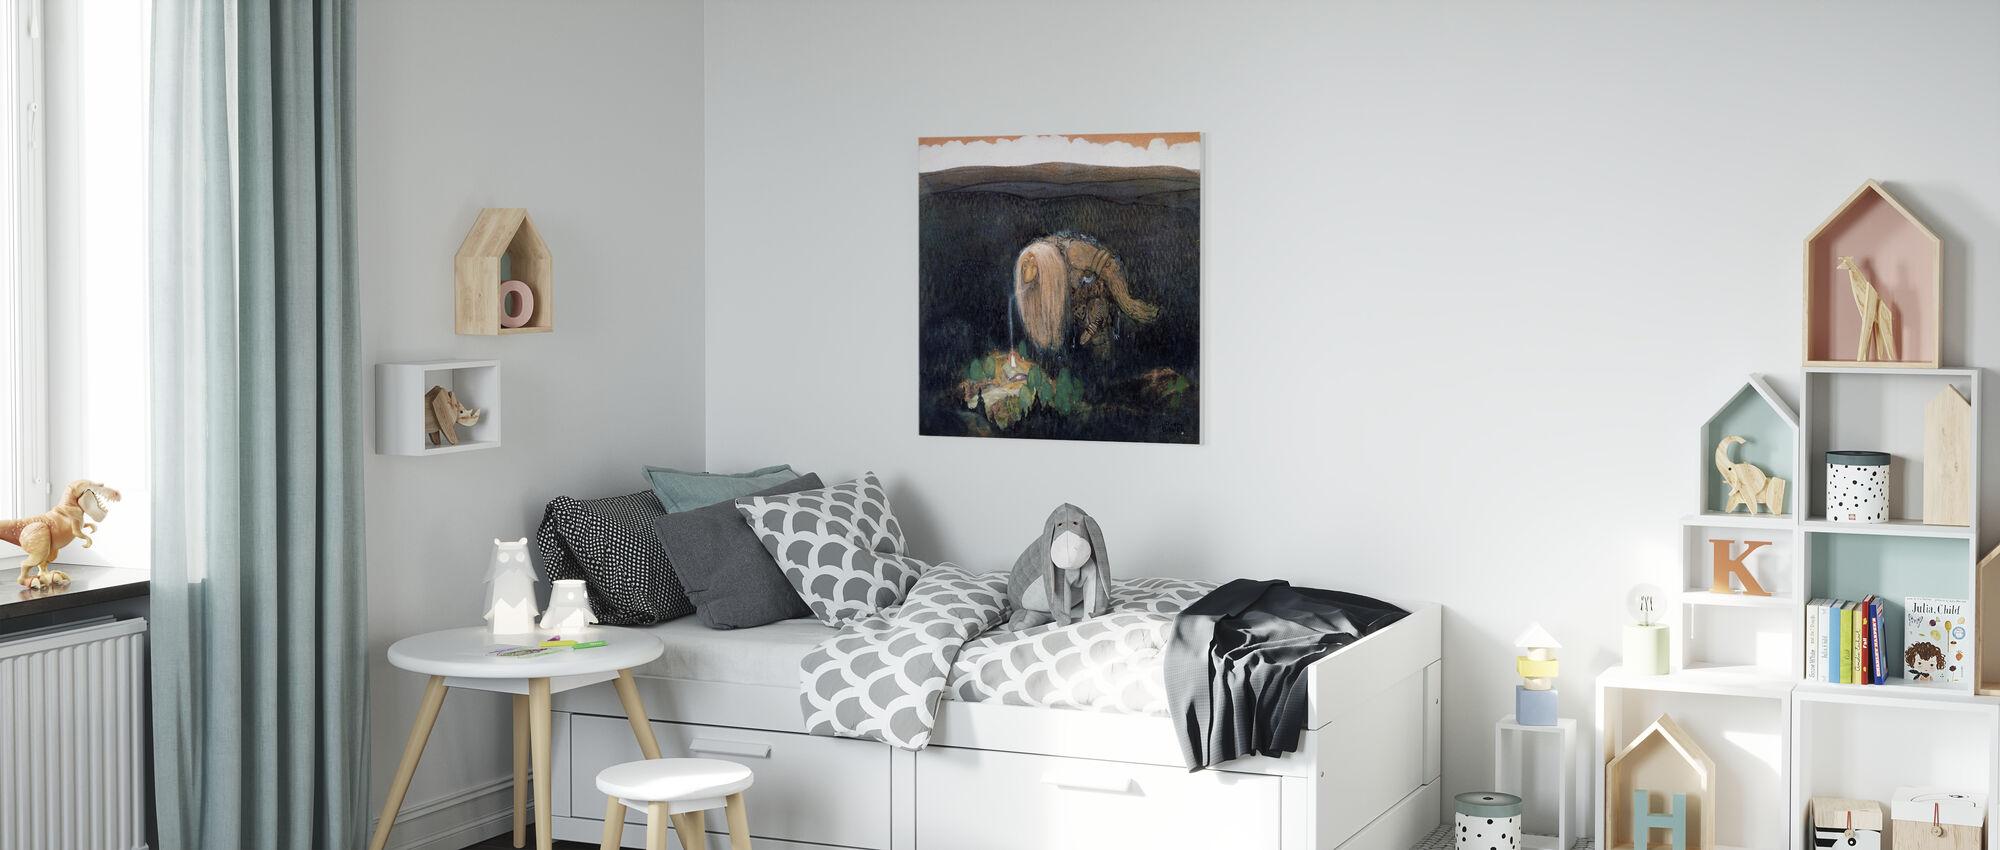 Skogstroll - John Bauer - Impression sur toile - Chambre des enfants